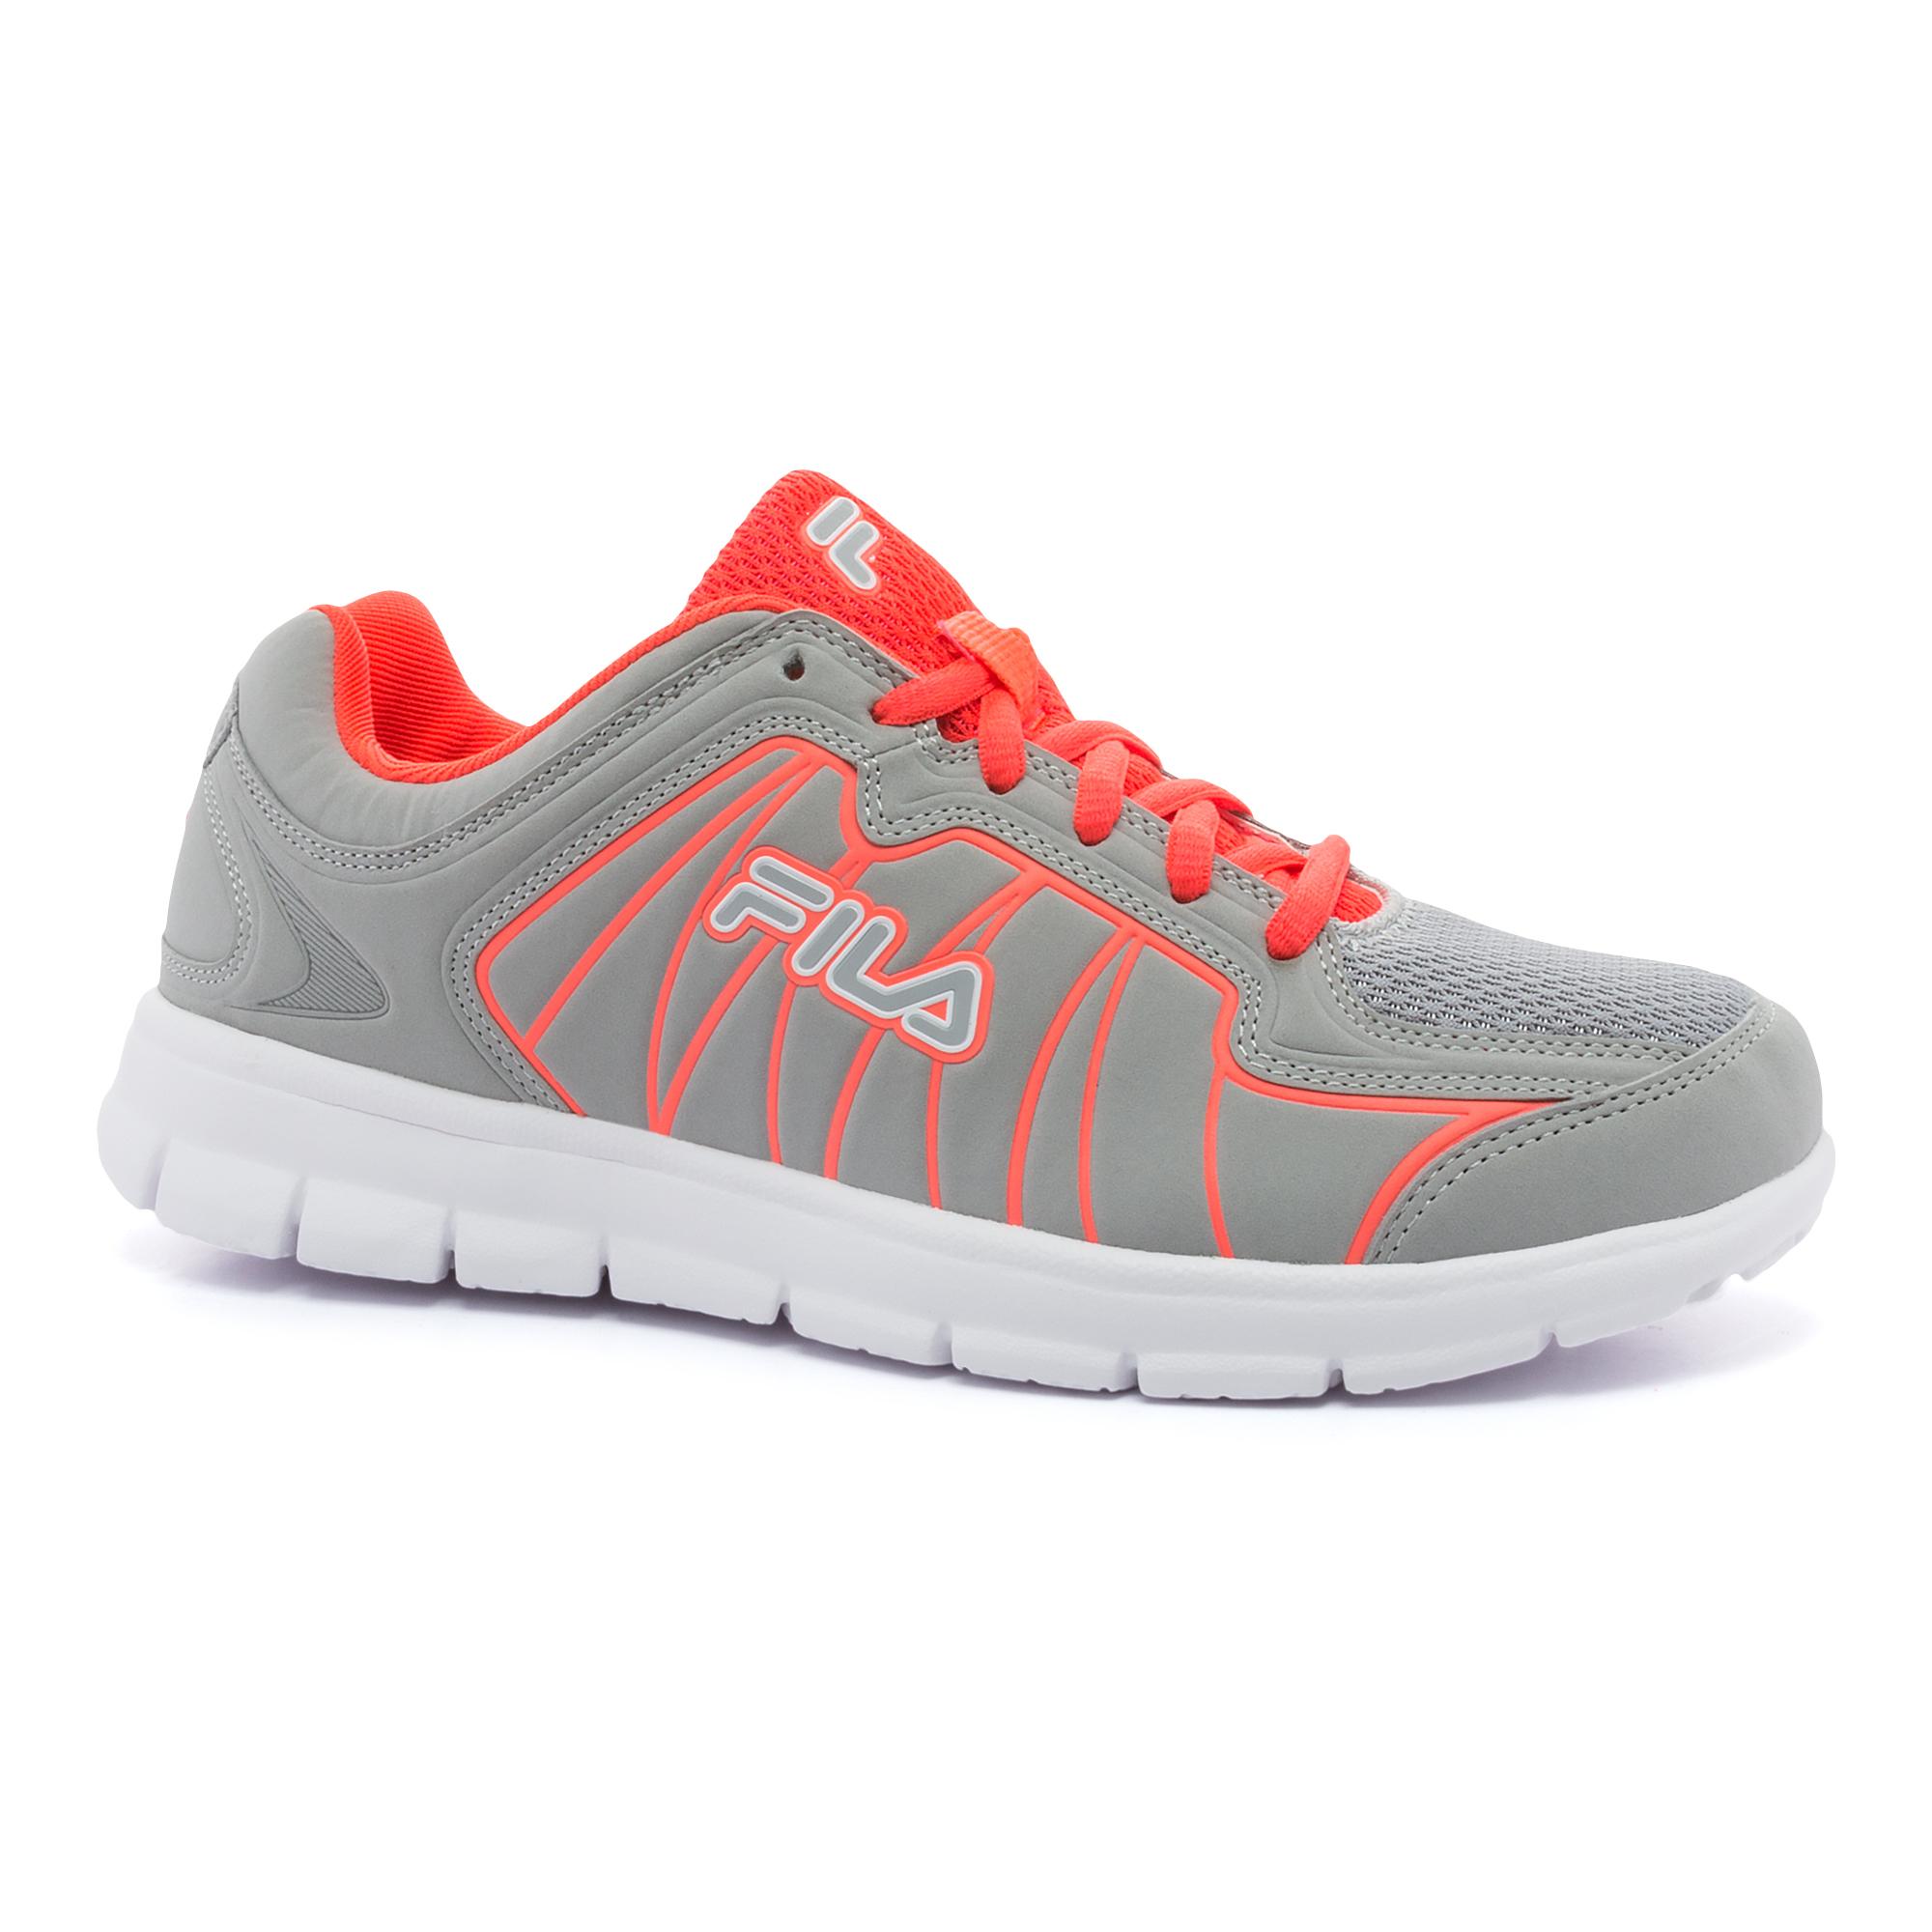 Is Fila A Good Running Shoe